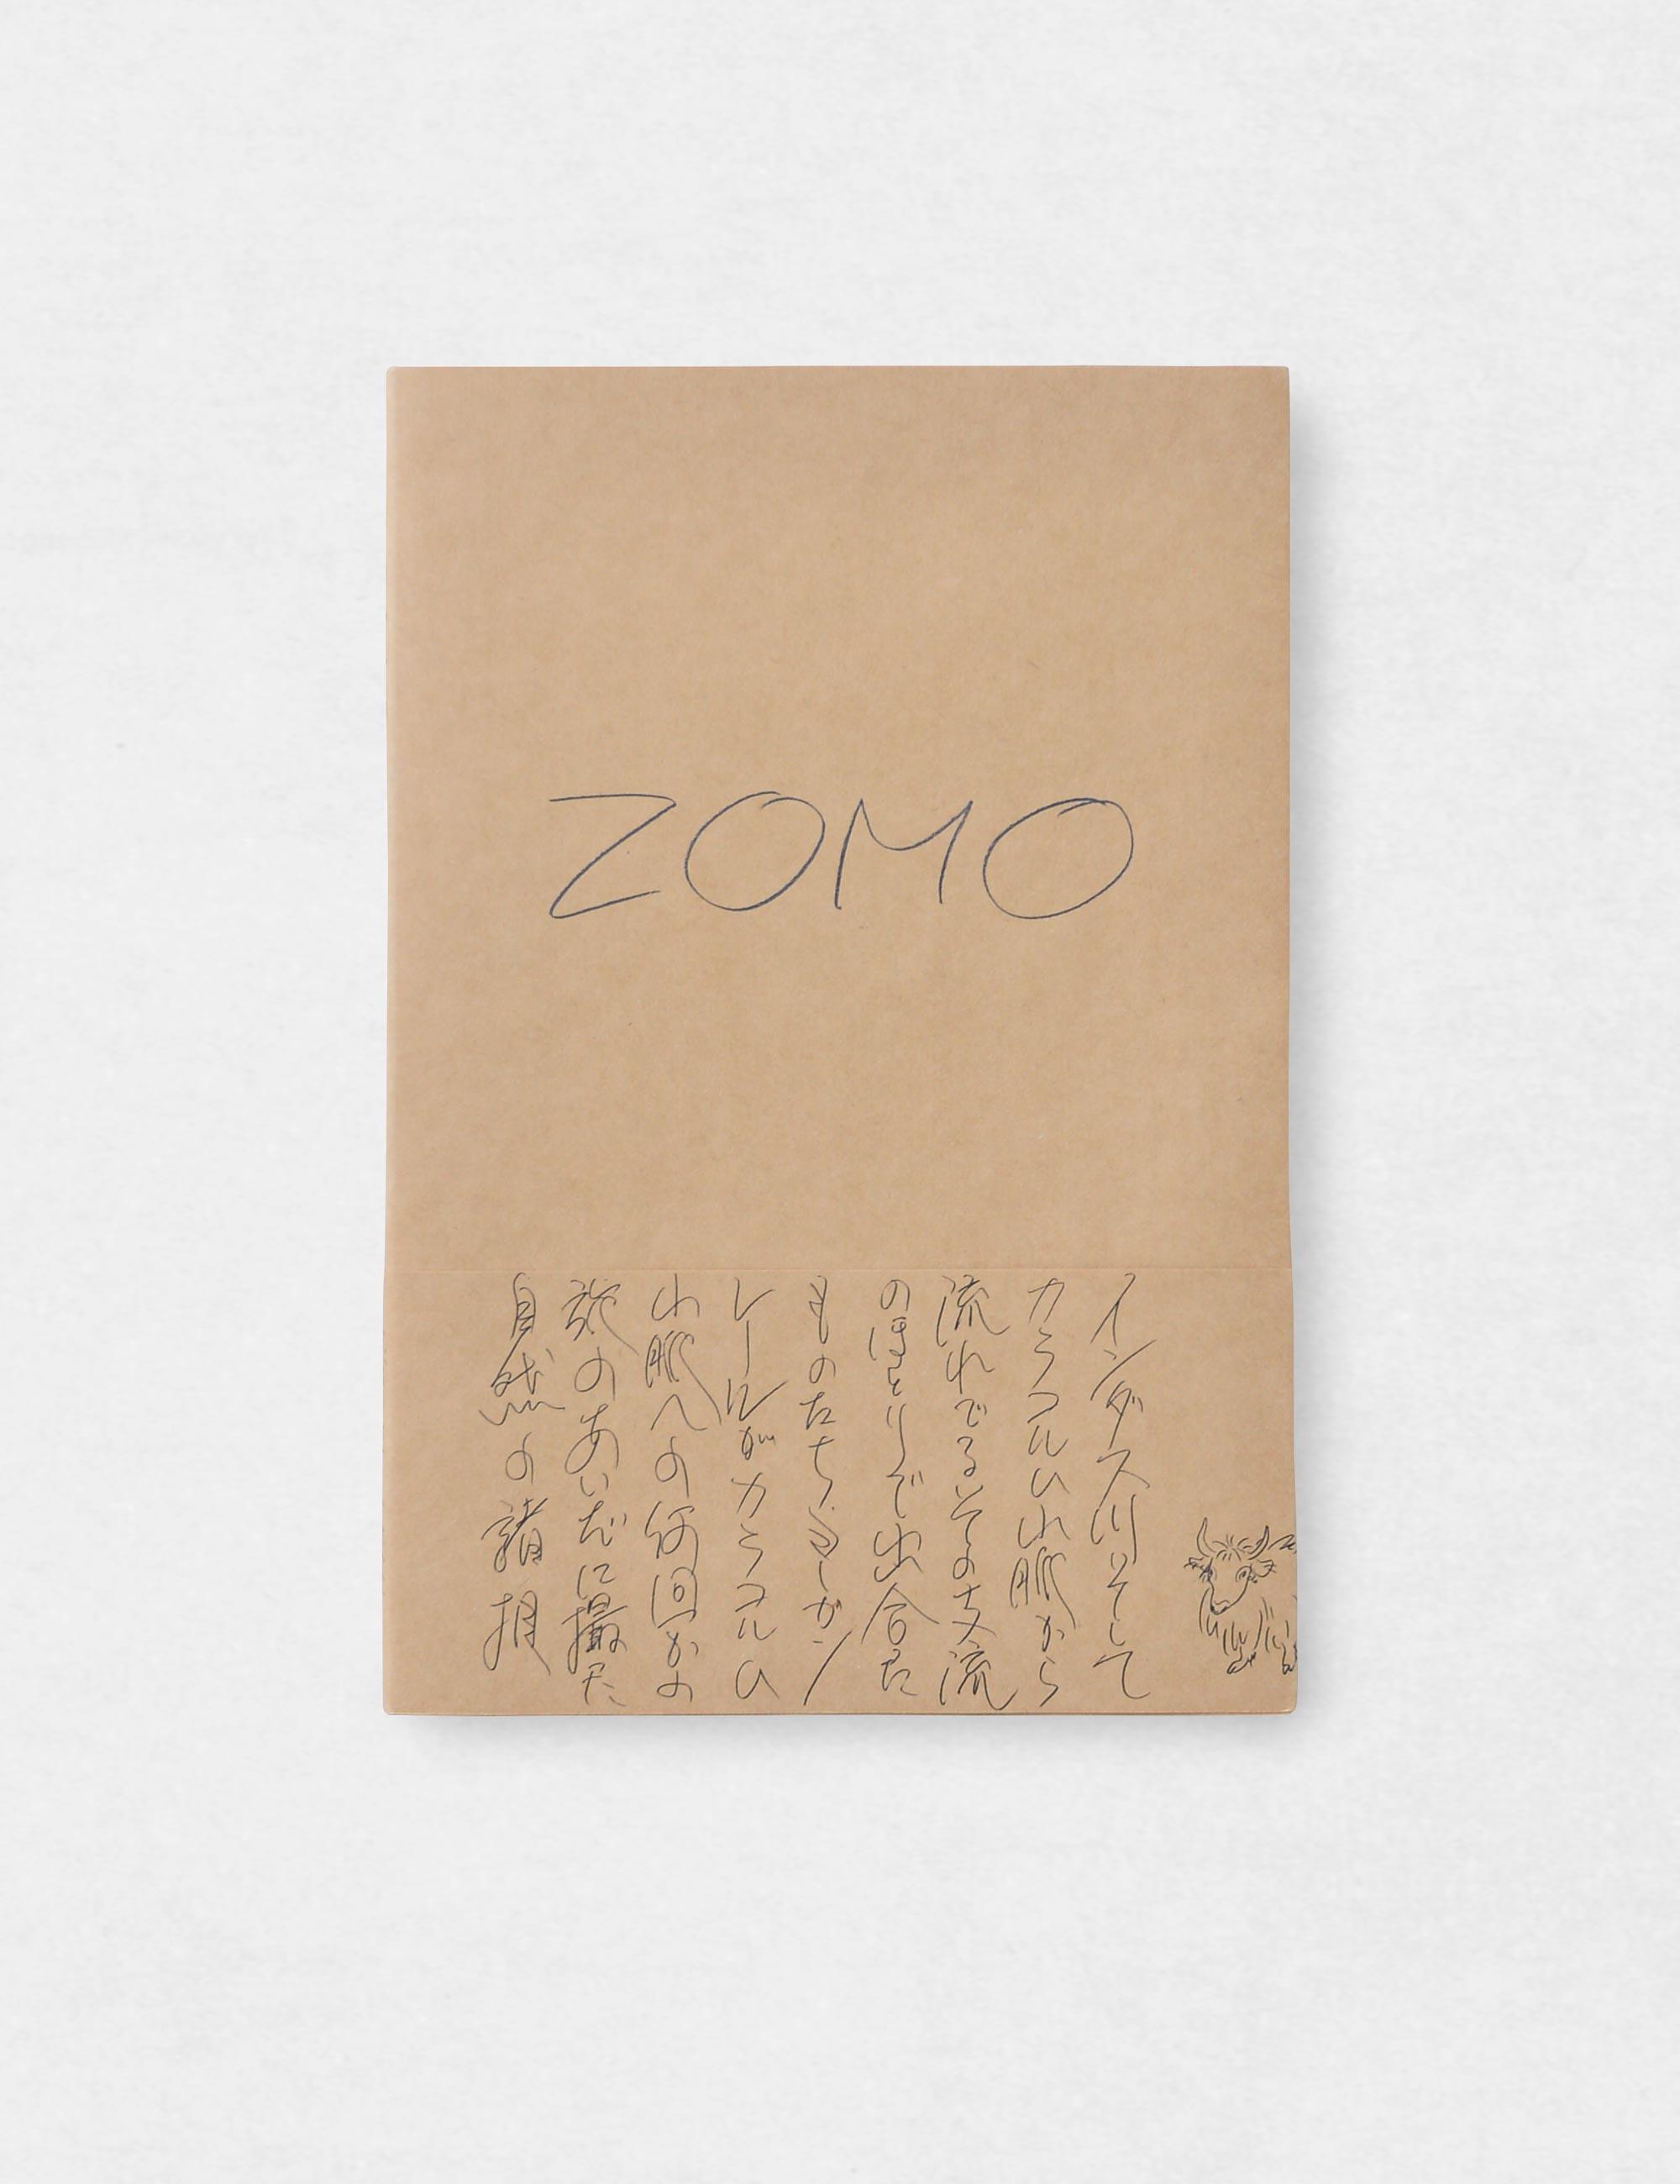 Jurgen Lehl Zomo Book